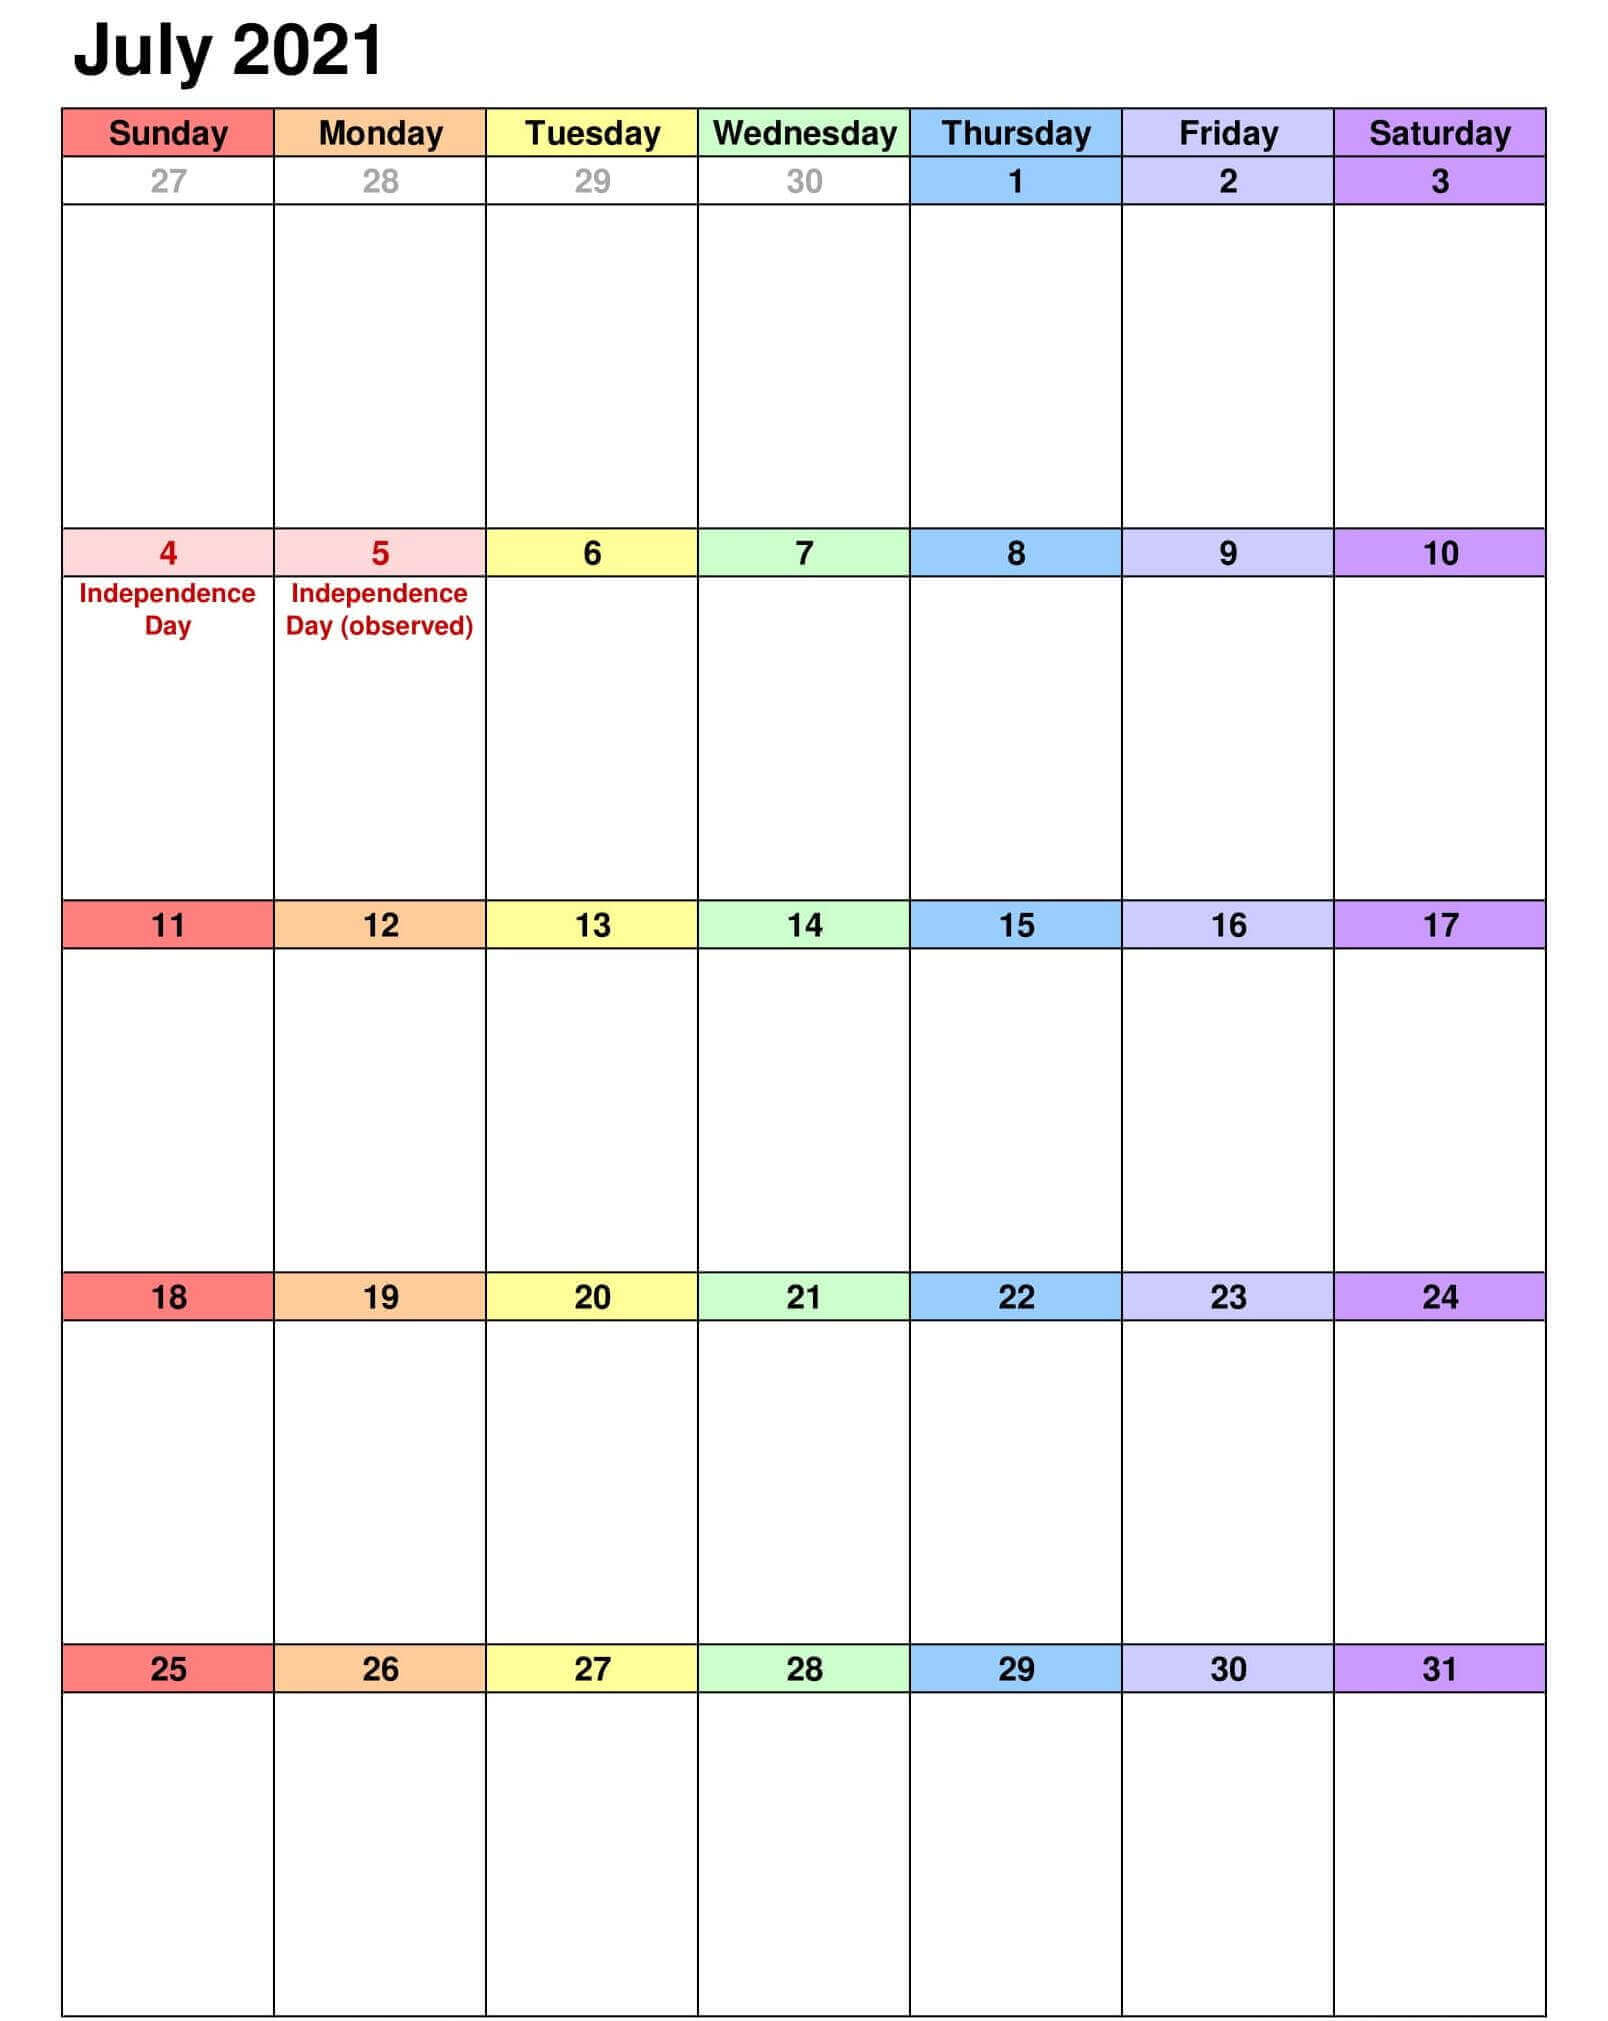 July 2021 Holidays Calendar Template